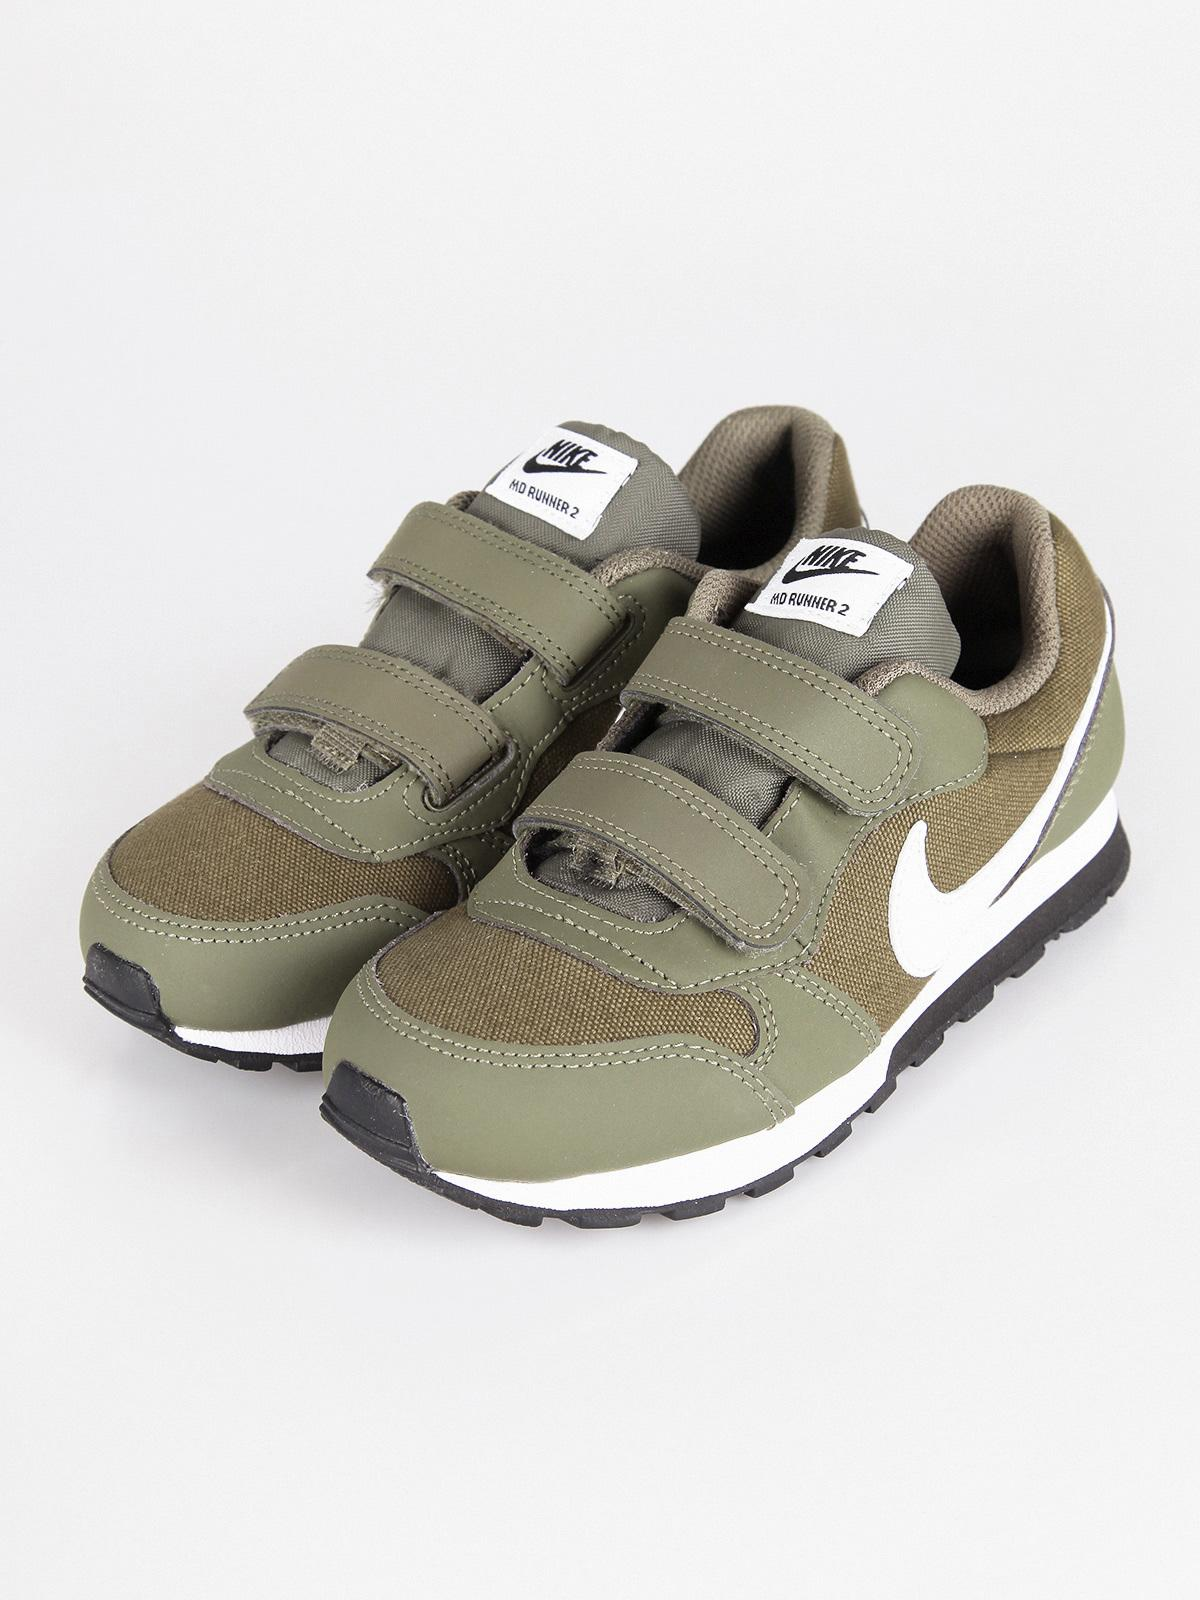 MD Runner 2 Zapatillas verdes militares chico | MecShopping